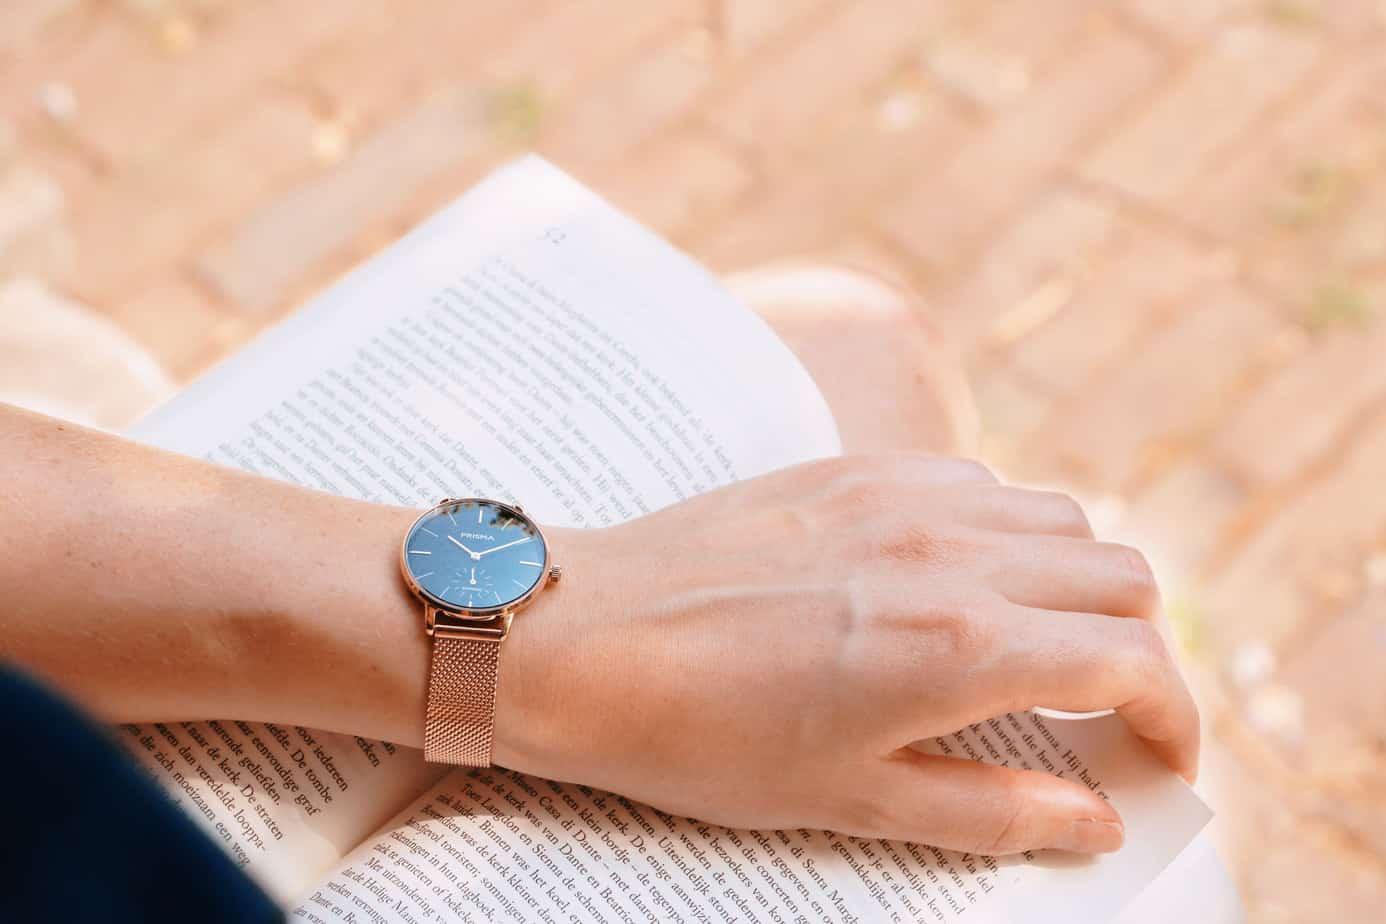 prisma horloges prisma watches